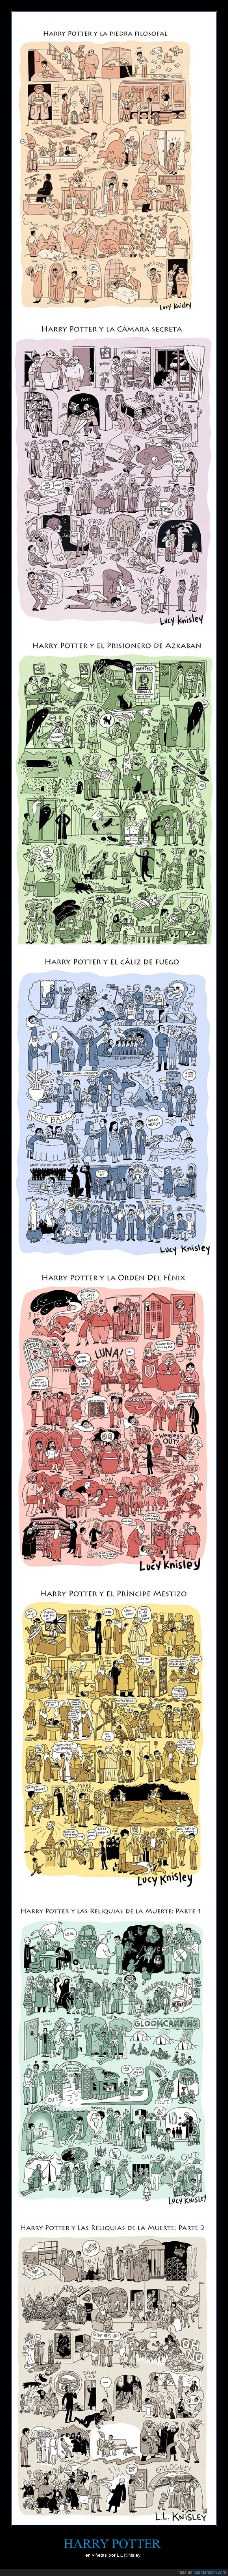 dibujos,harry potter,ll knisley,viñetas